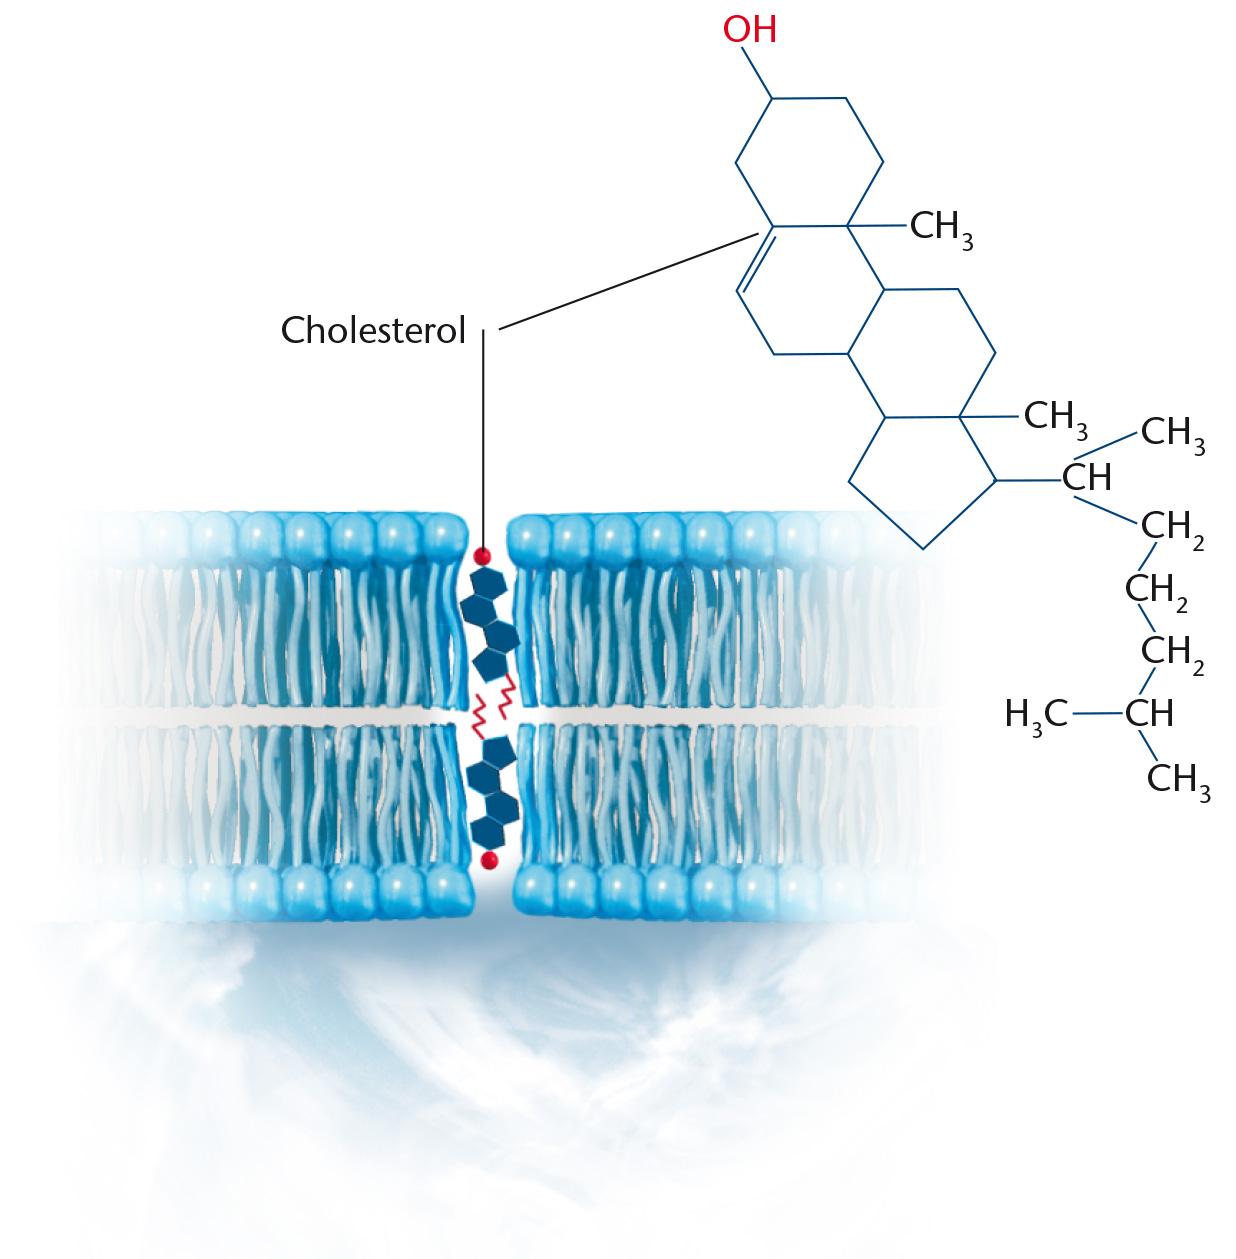 cellemembranens opbygning